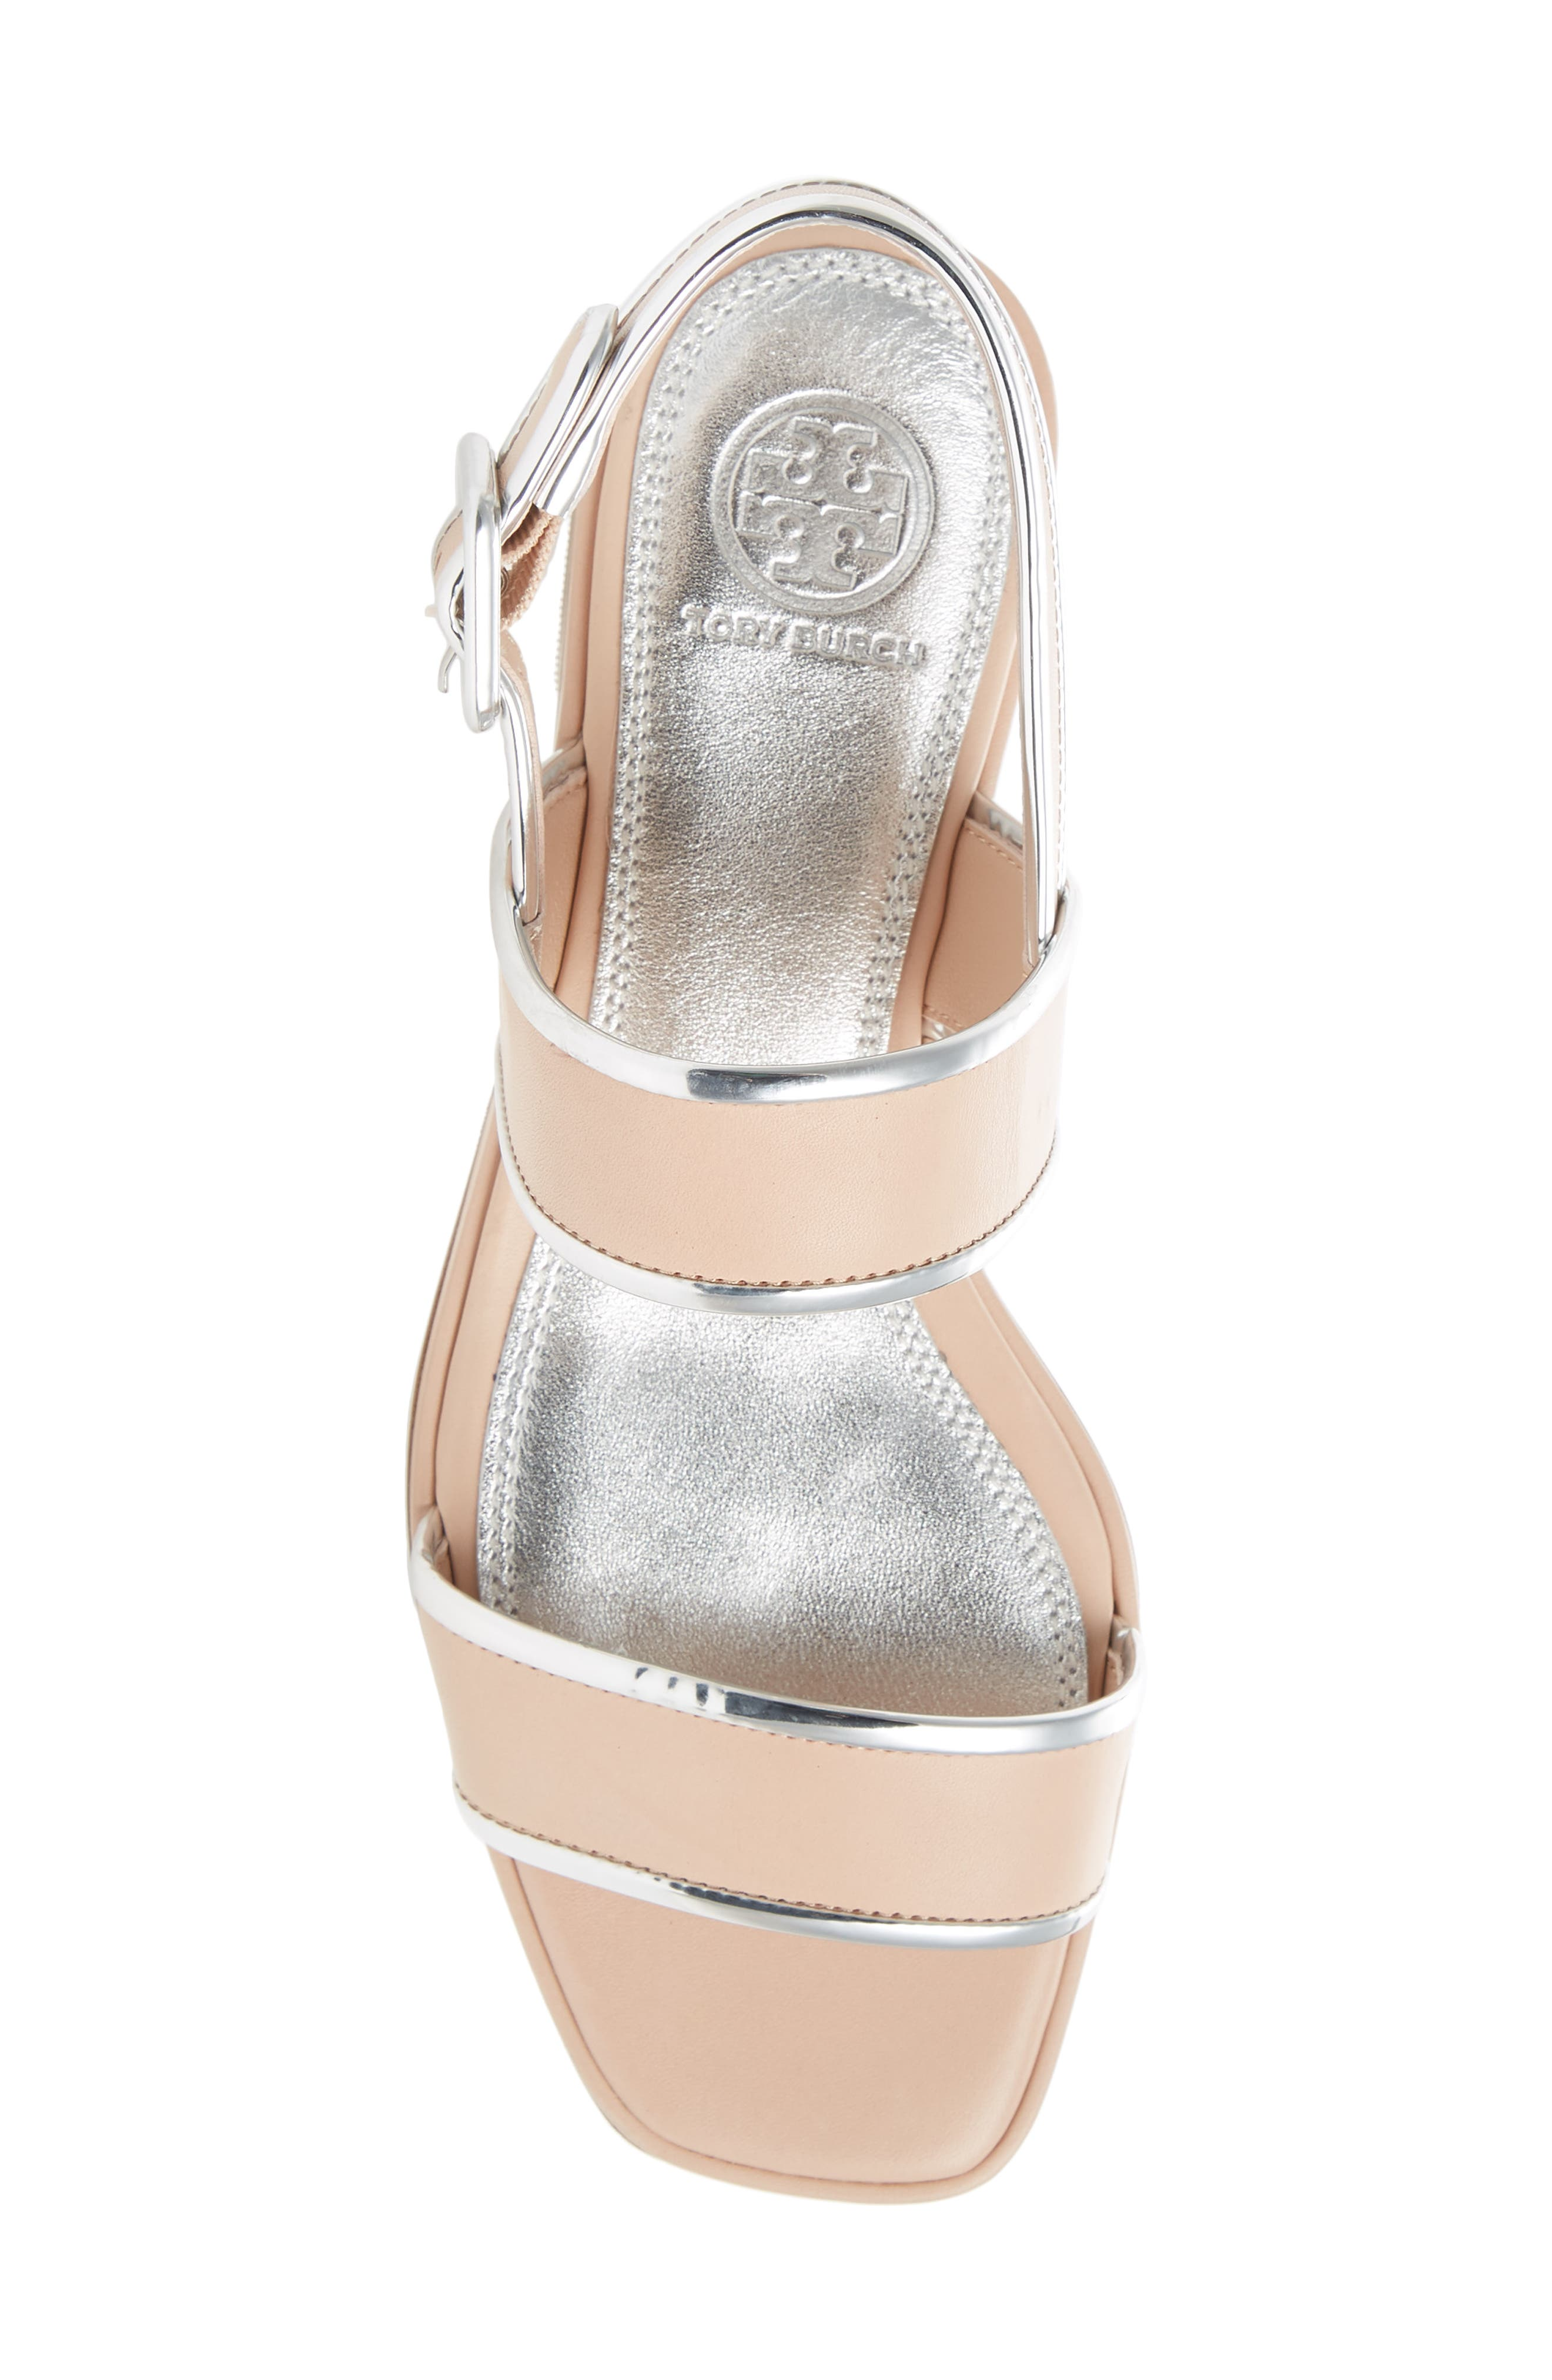 Delaney Double Strap Sandal,                             Alternate thumbnail 5, color,                             Goan Sand/ Silver